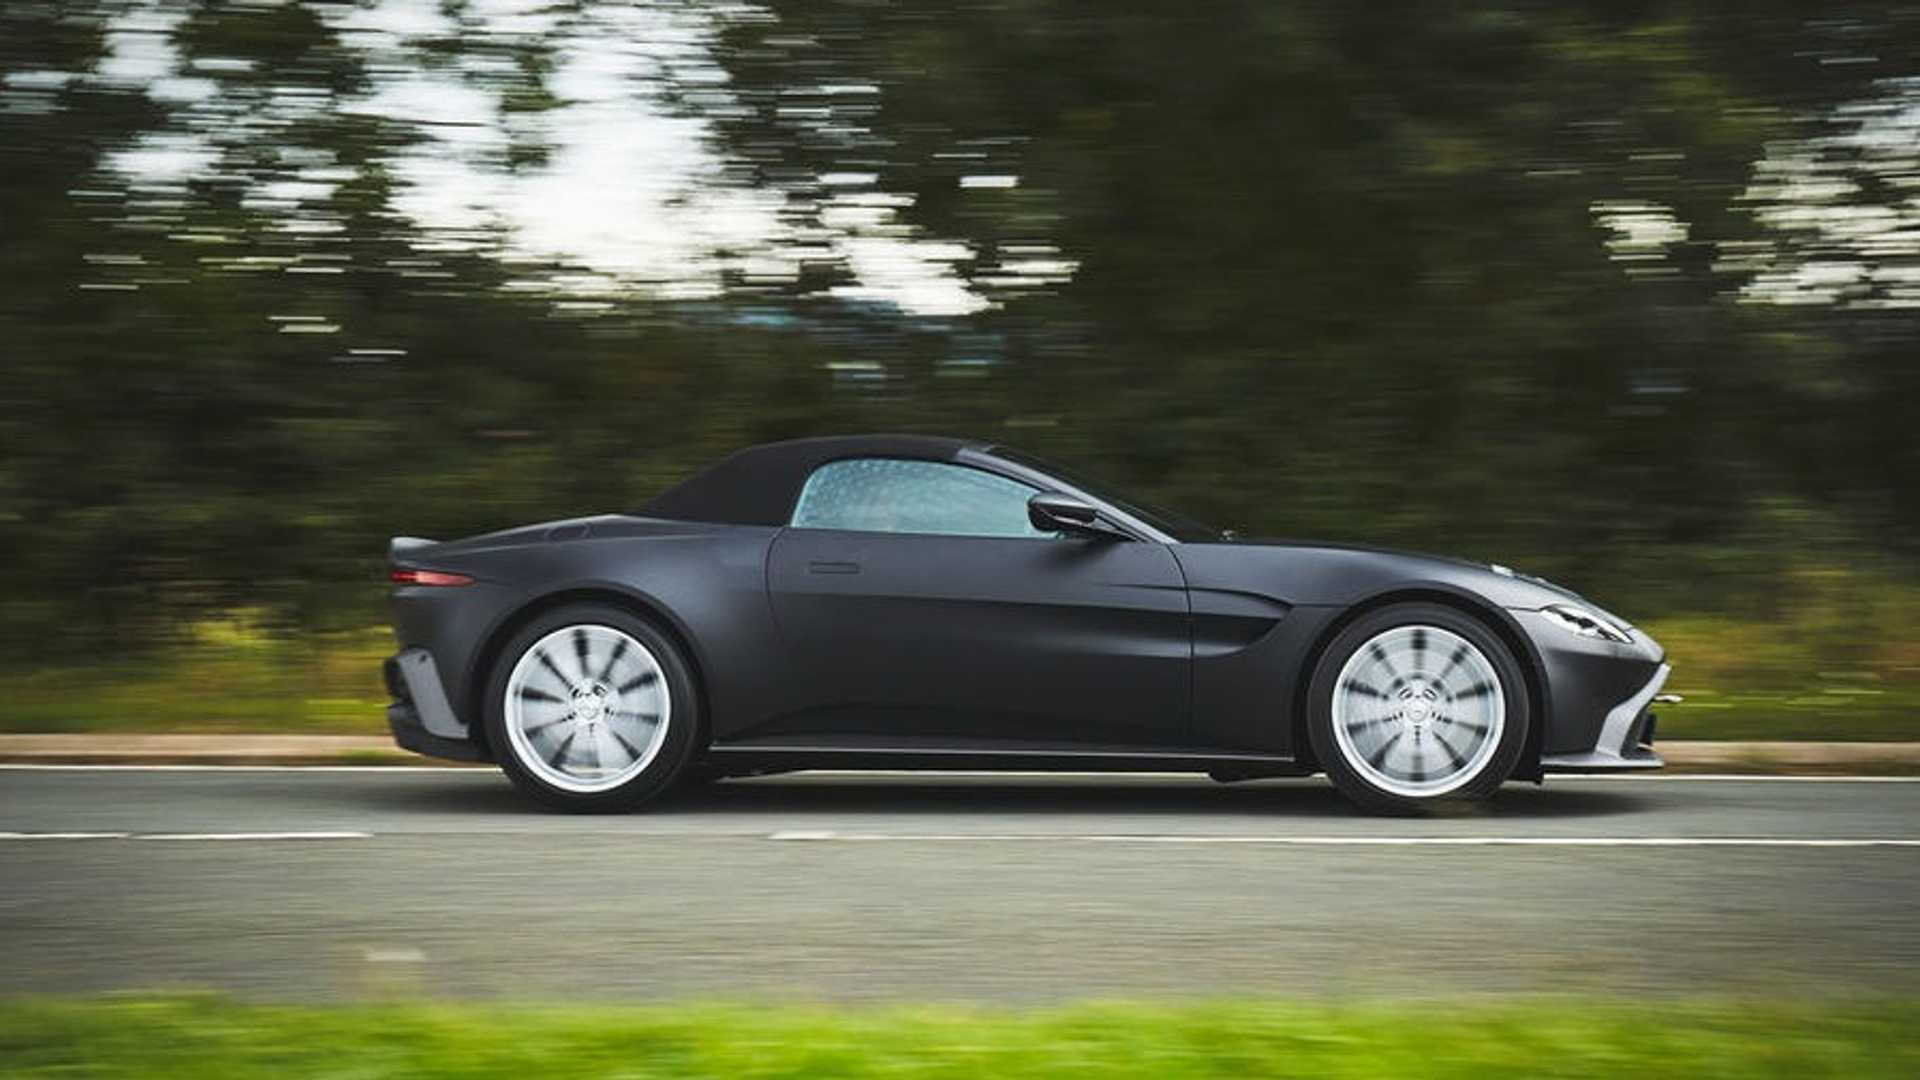 Teaser for 2020 Aston Martin Vantage Roadster